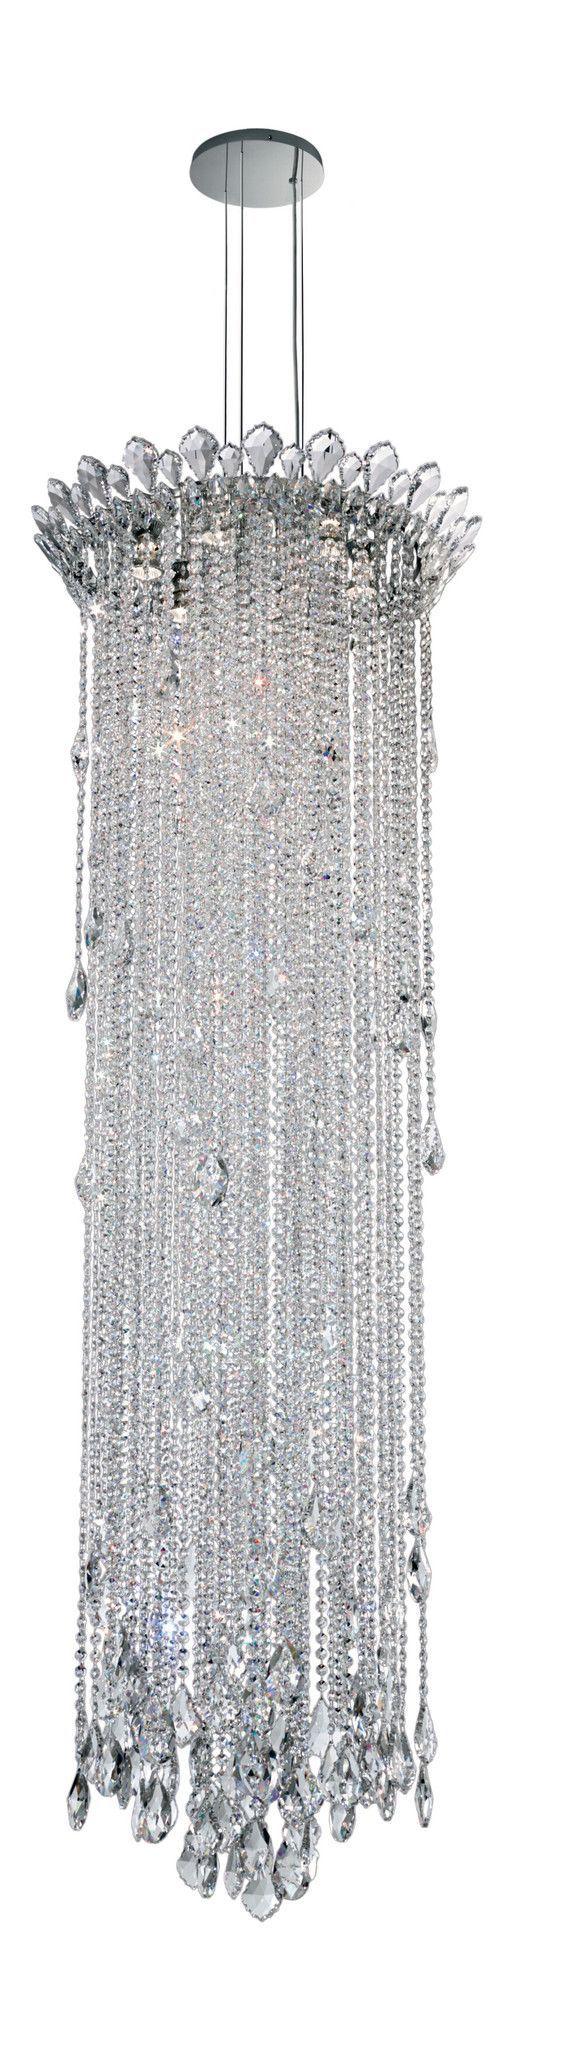 234 best chandelier loooove images on pinterest chandeliers schonbek tr2413 trilliane strands 24 inch chandelier arubaitofo Choice Image